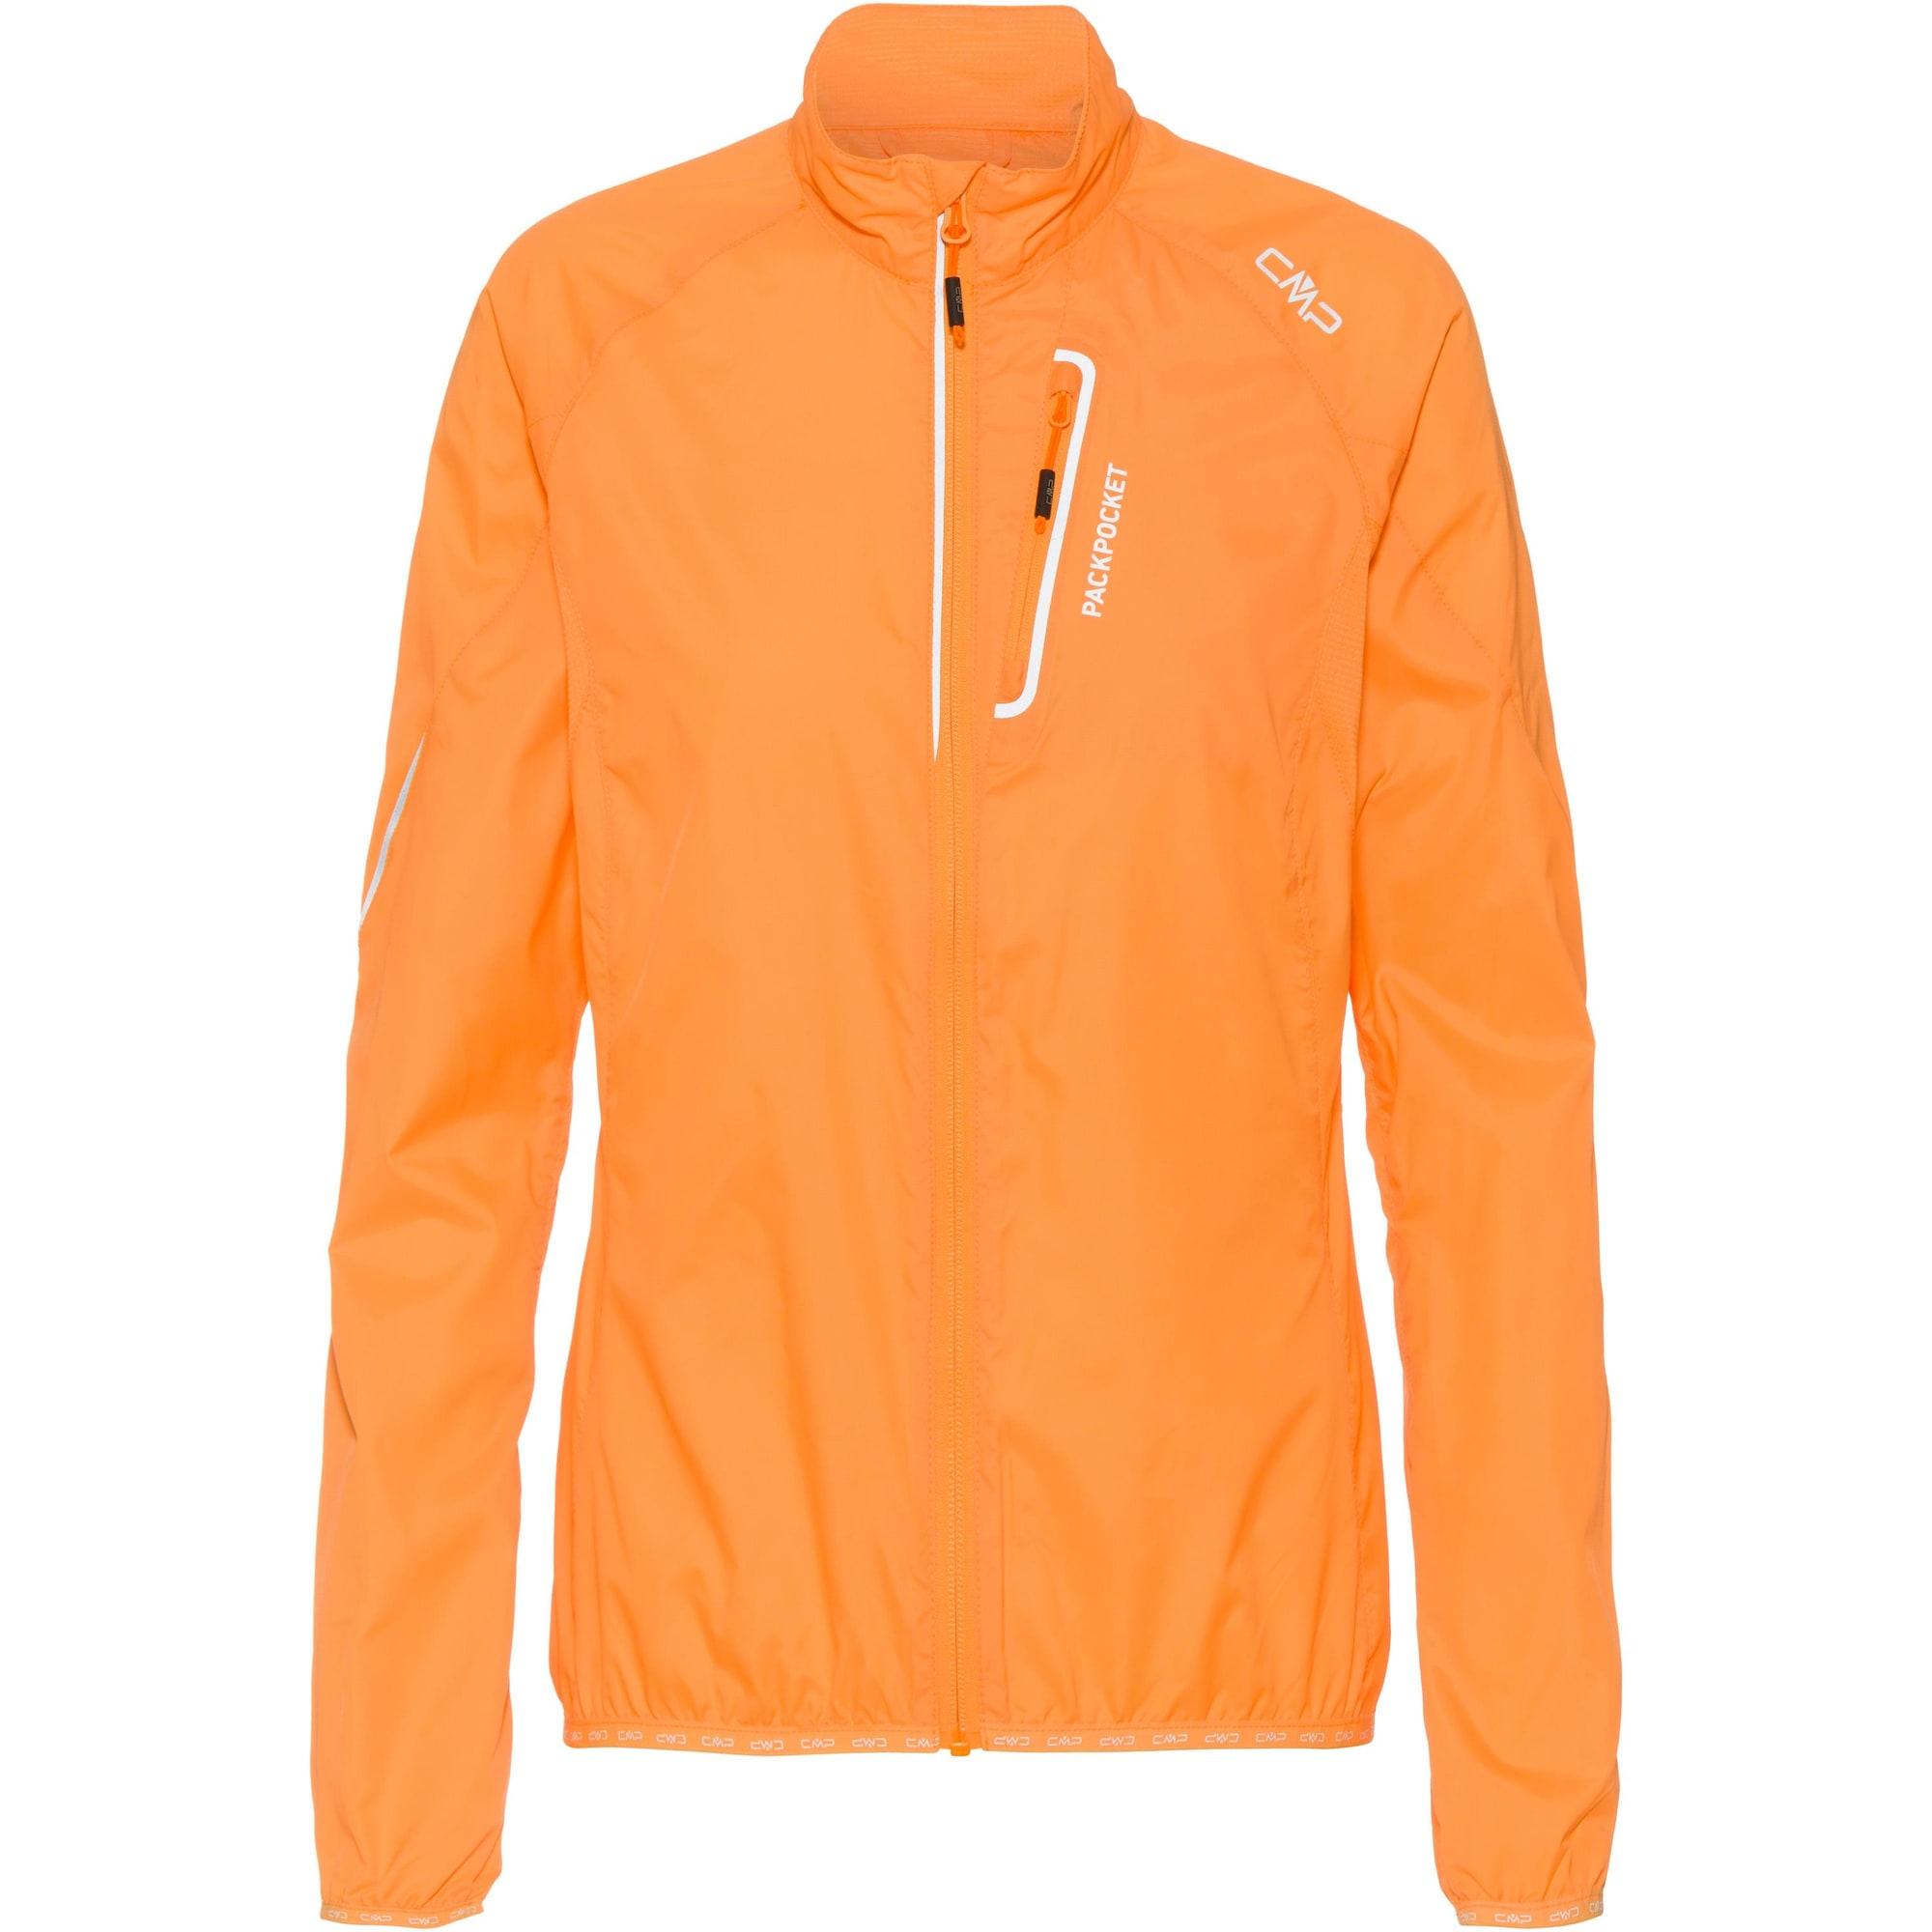 Fahrradjacke 'Woman Jacket' | Sportbekleidung > Sportjacken > Fahrradjacken | CMP